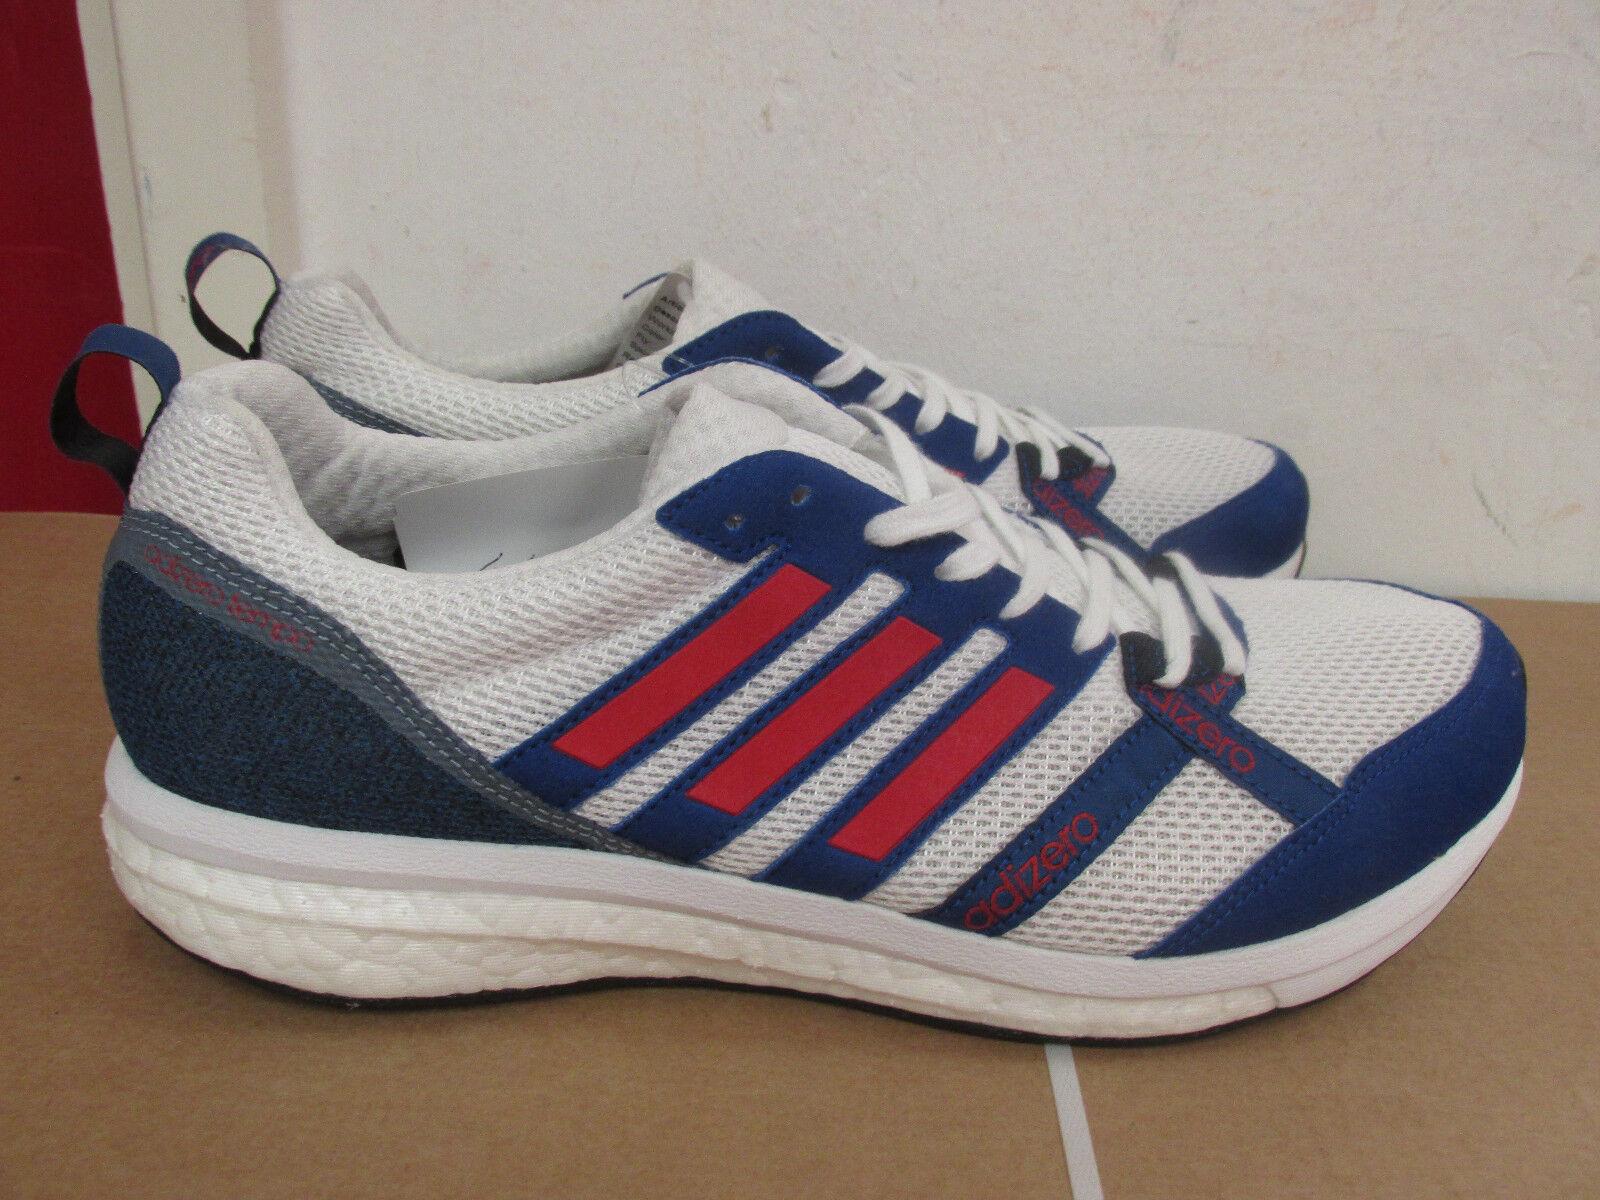 Adidas adizero tempo 8 AKT BA8245 mens trainers sneakers SAMPLE